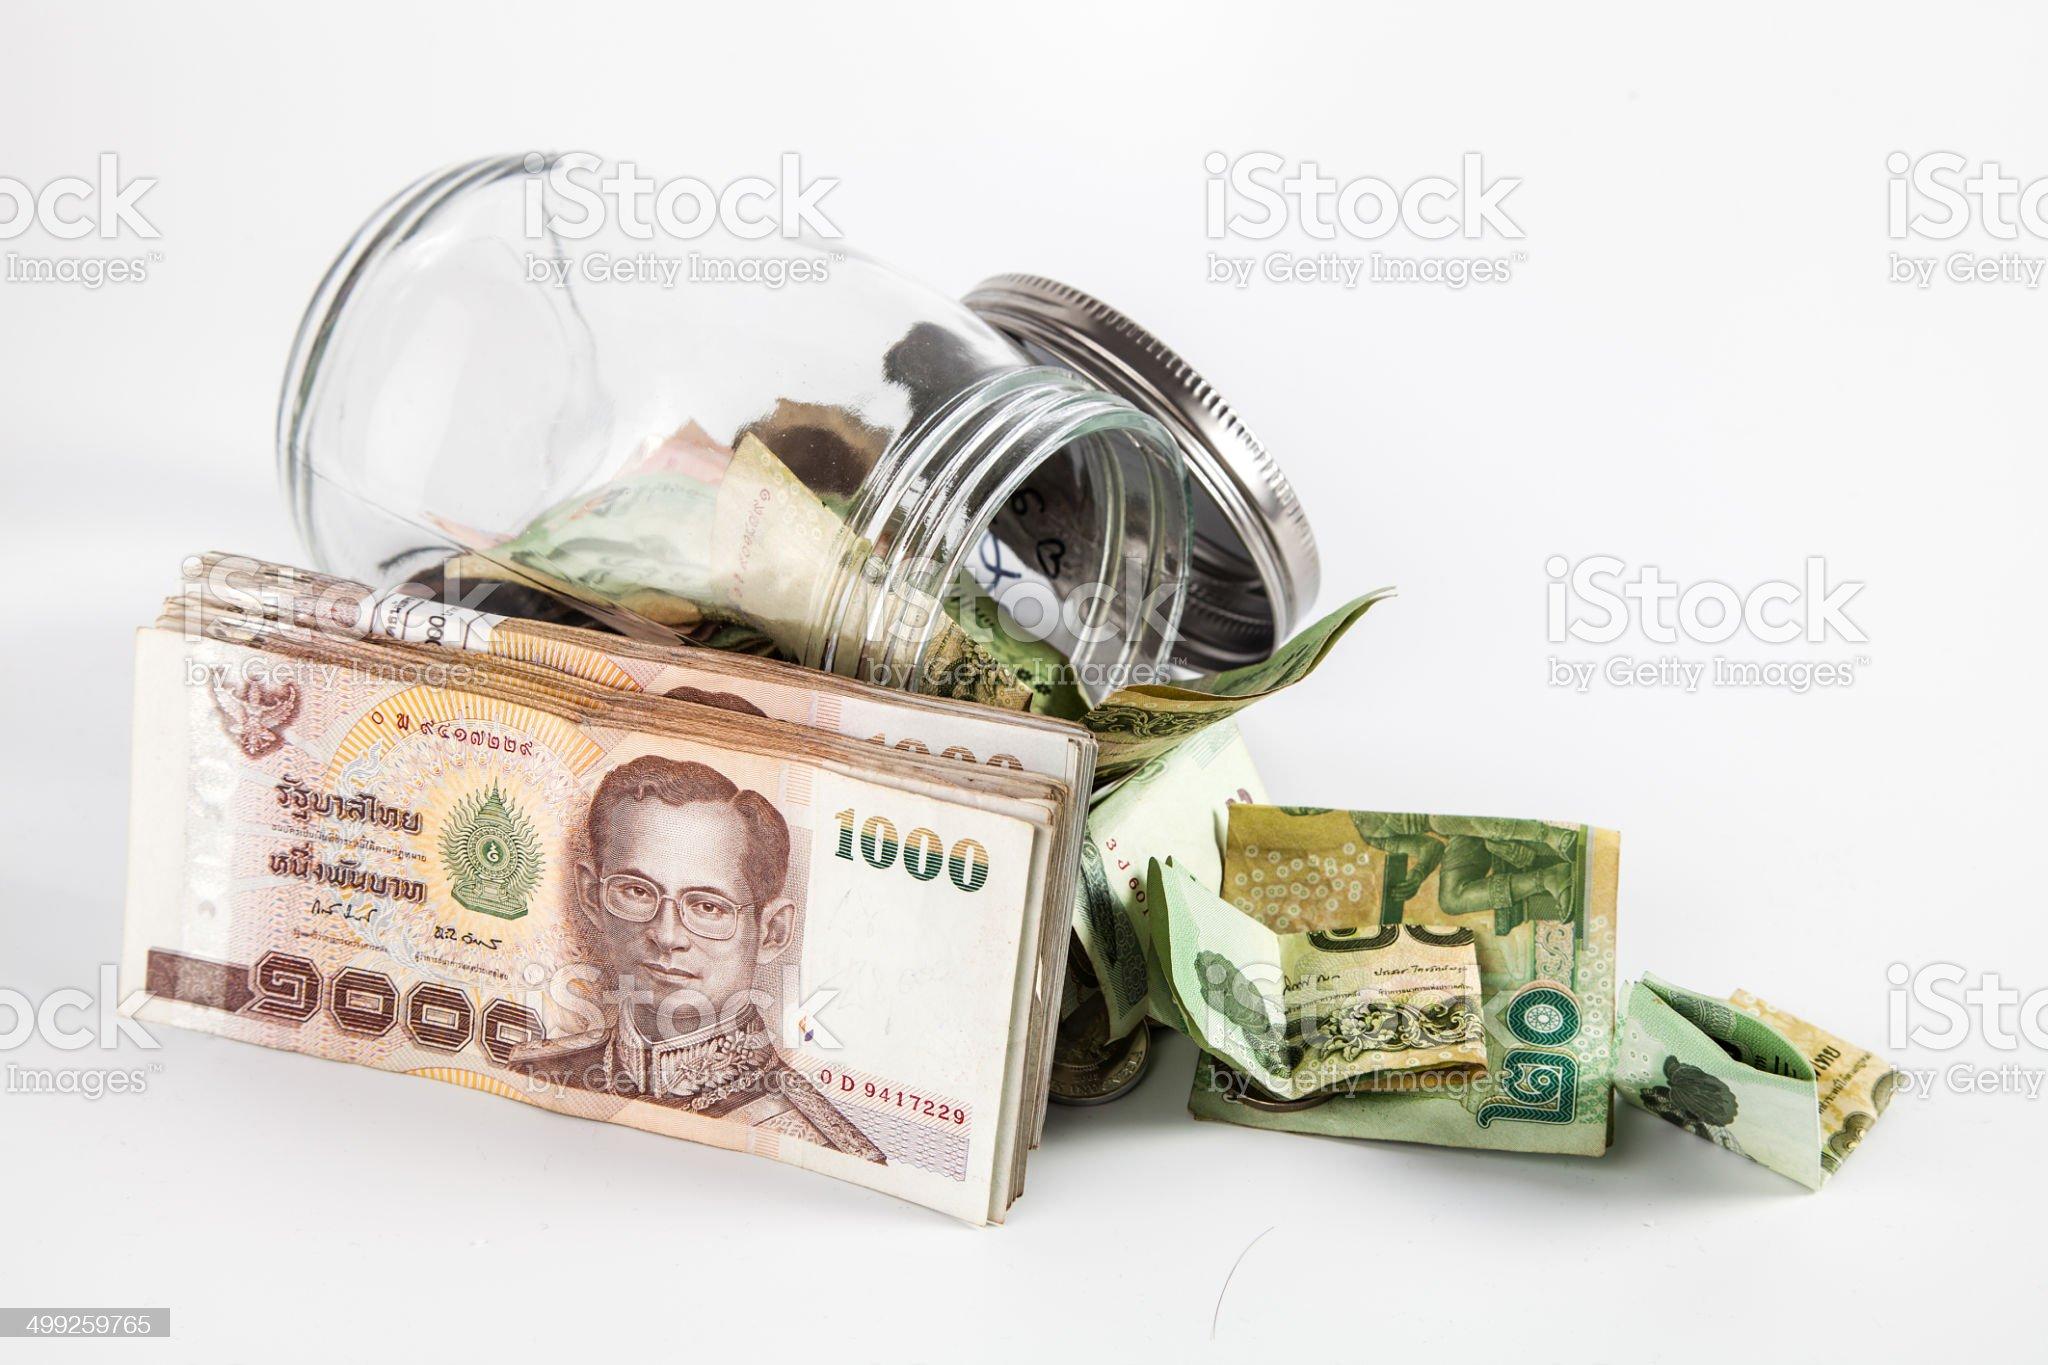 Money jar with isolate white background royalty-free stock photo